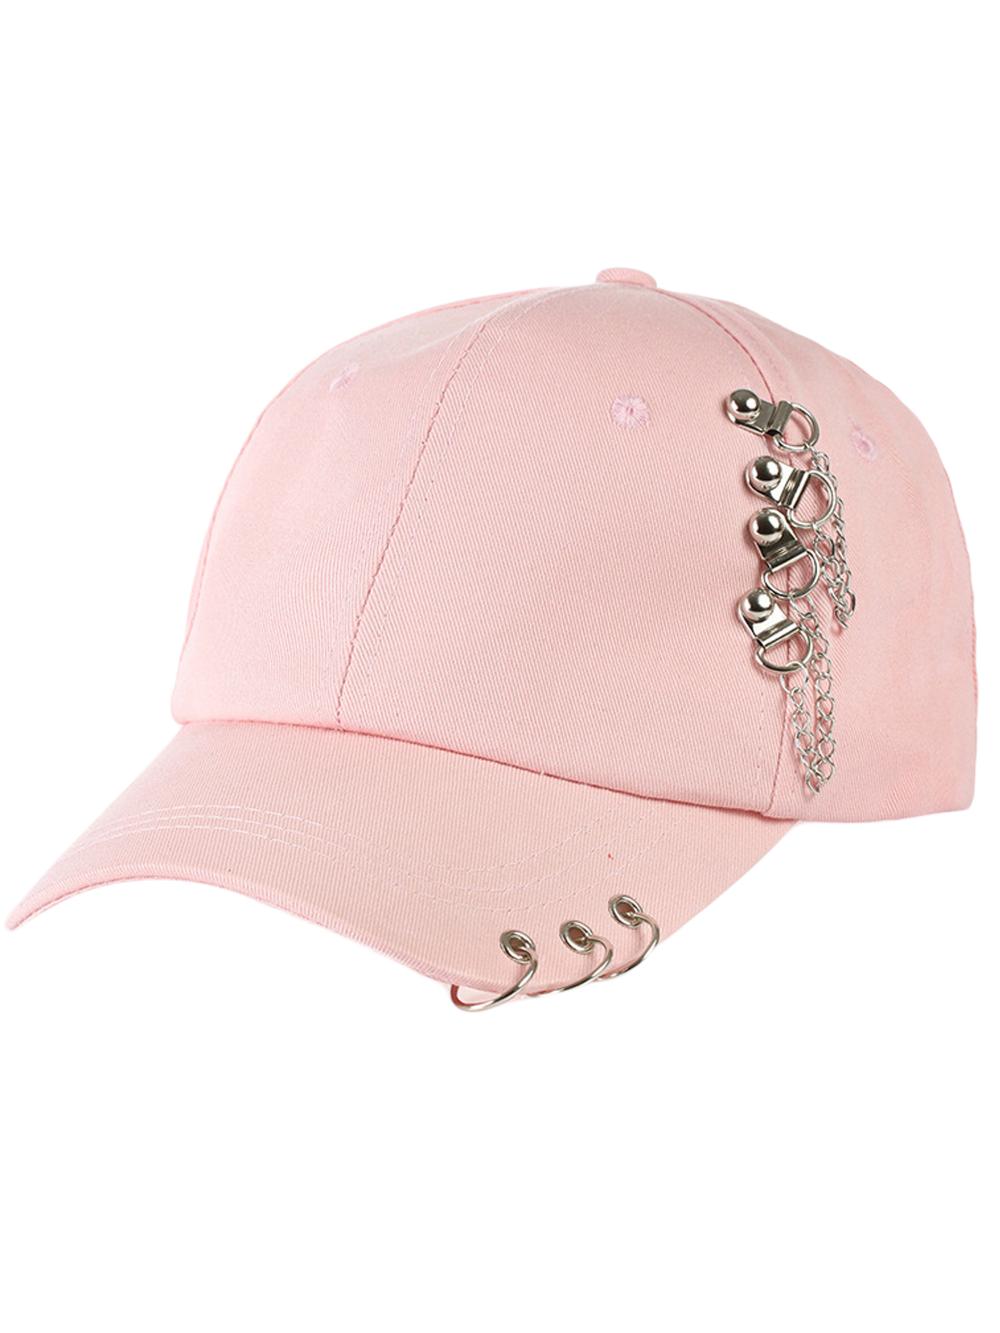 Pudcoco Baseball Cap With Rings Kpop Bts Snapback Trucker Hat Women Men Sun Cap Walmart Com In 2021 Kpop Hat Hats Sun Cap